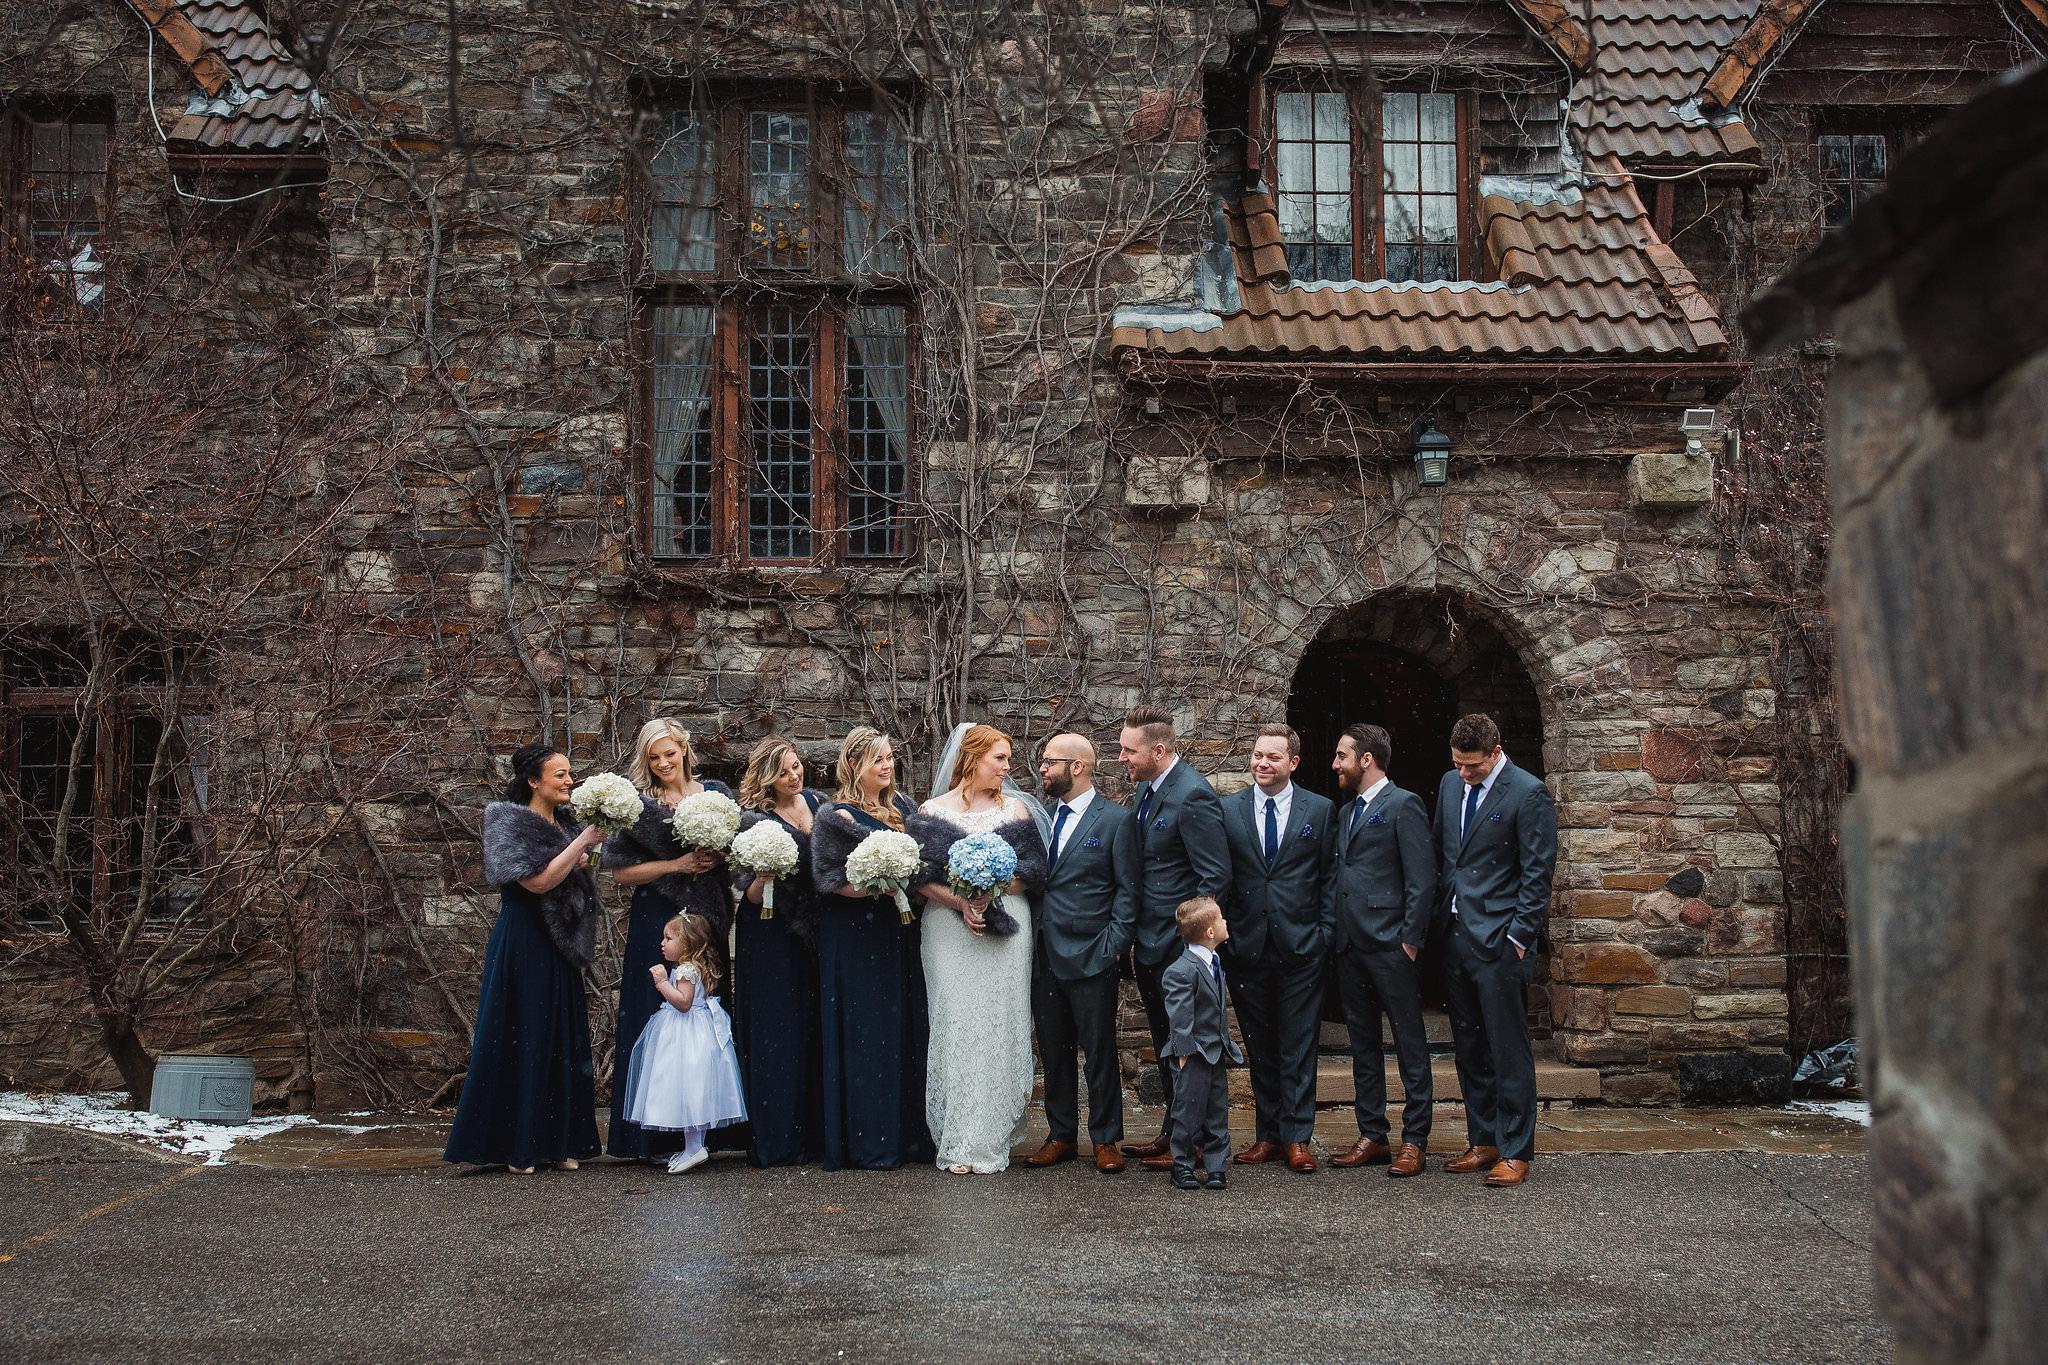 wedding party photos bob rumball manor